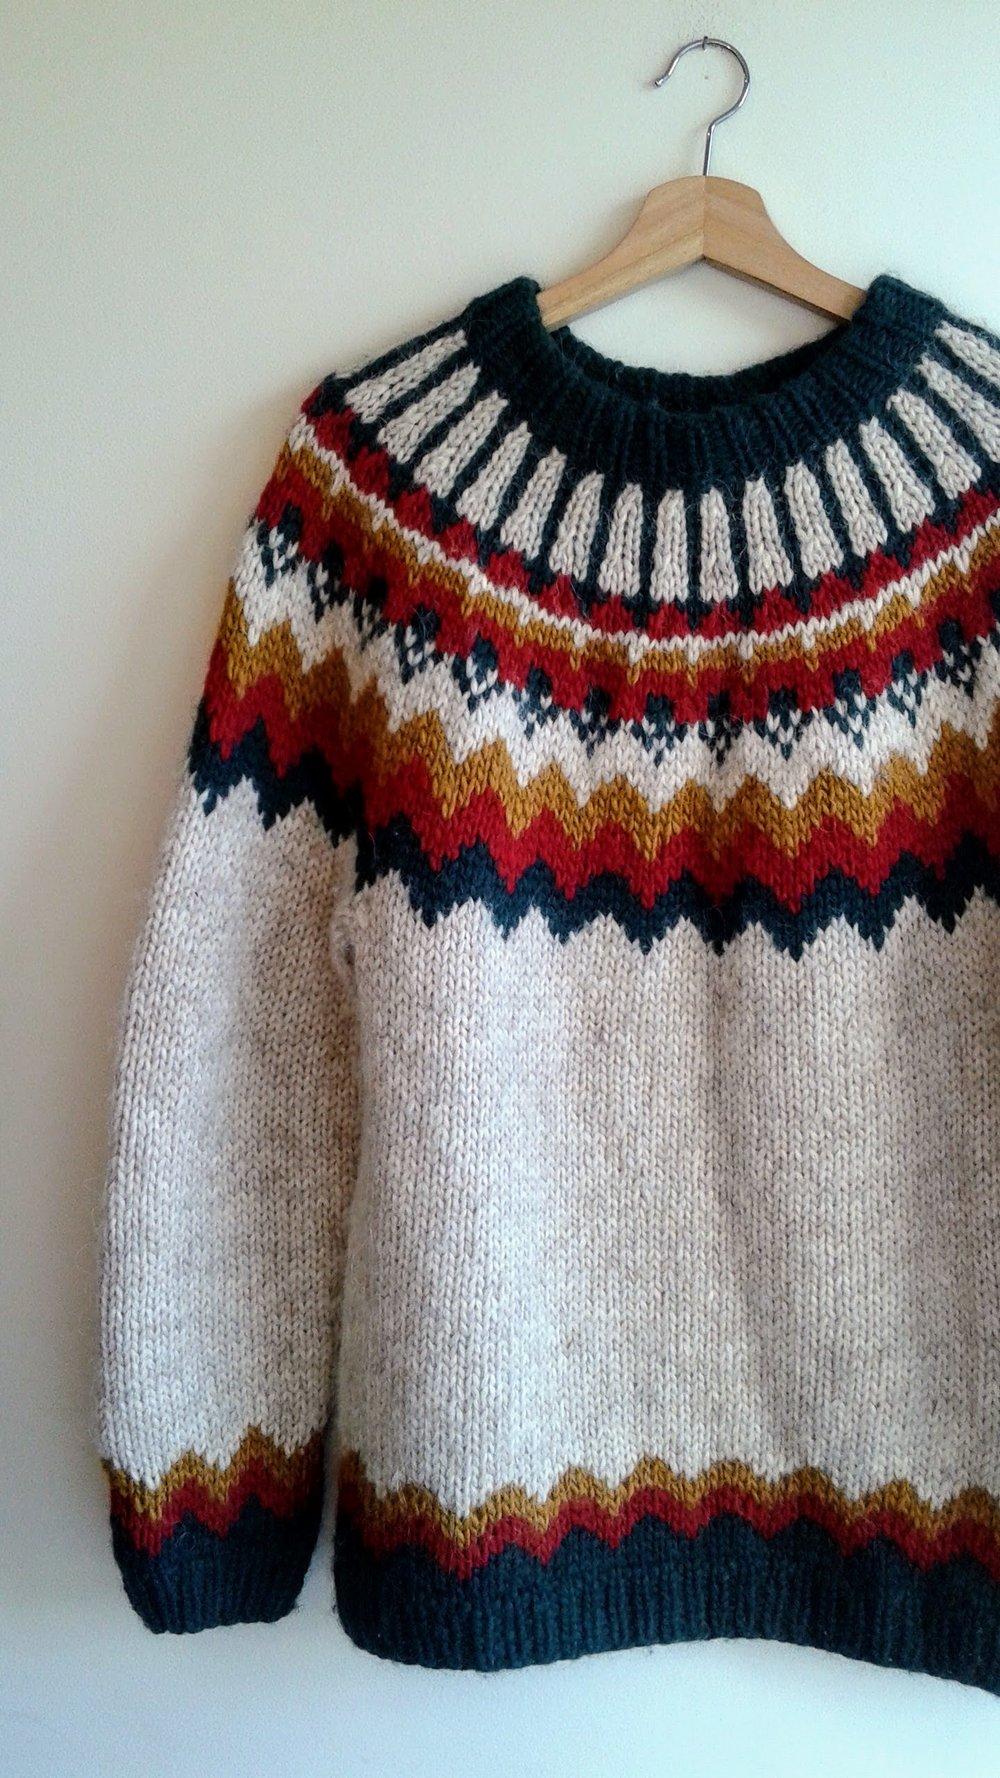 Icelandic sweater; Size M/L, $52